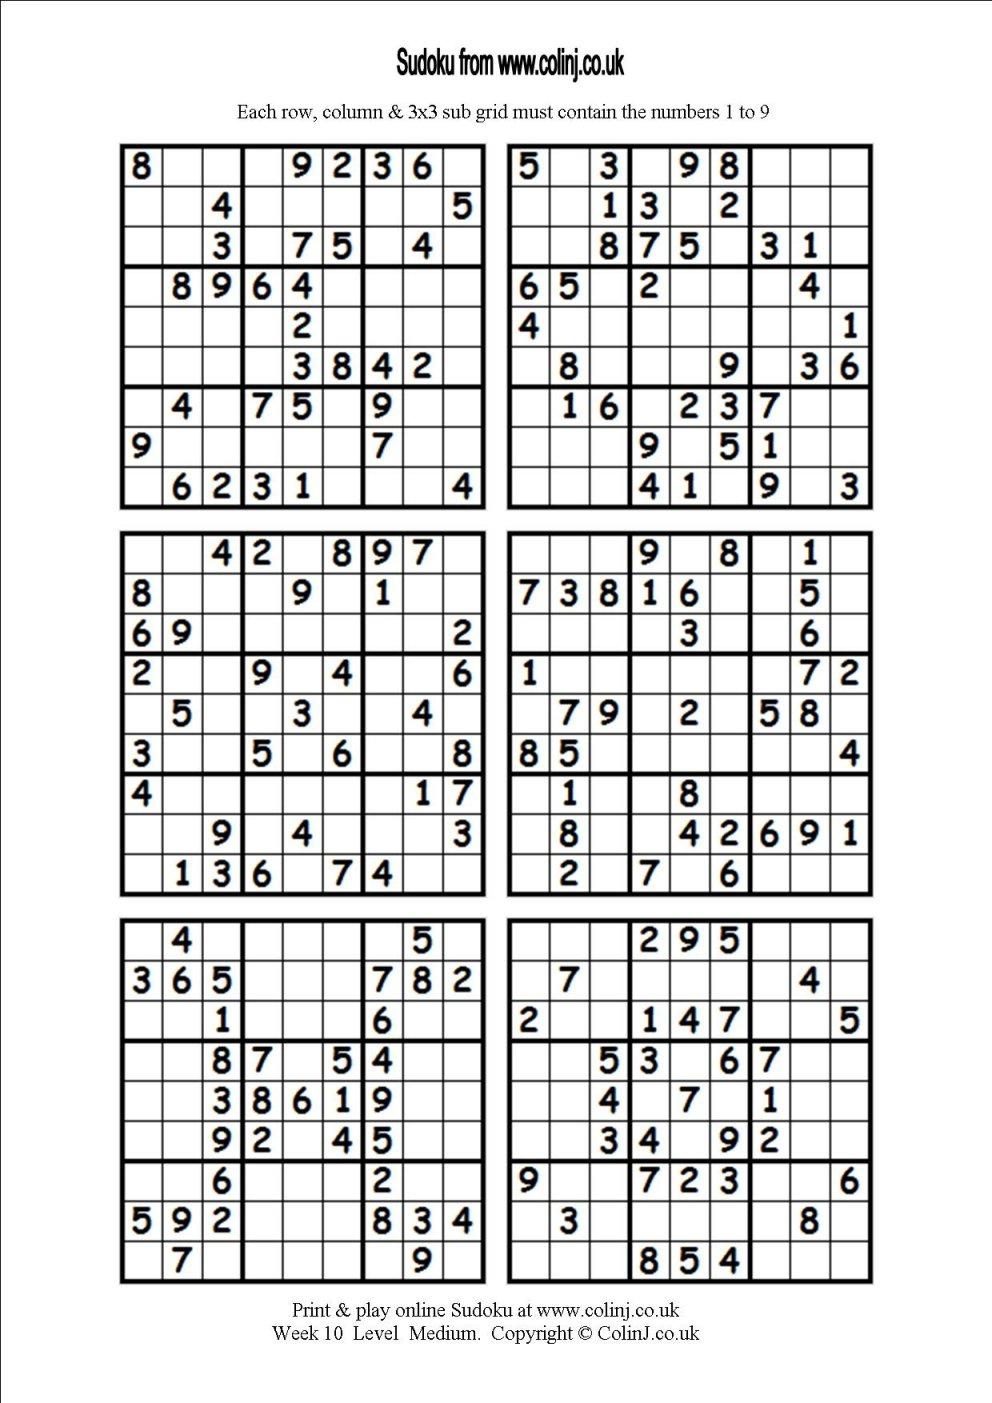 Printable Sudoku Puzzles 6 Per Page | Download Them Or Print - Free - Printable Sudoku Puzzles 6 Per Page